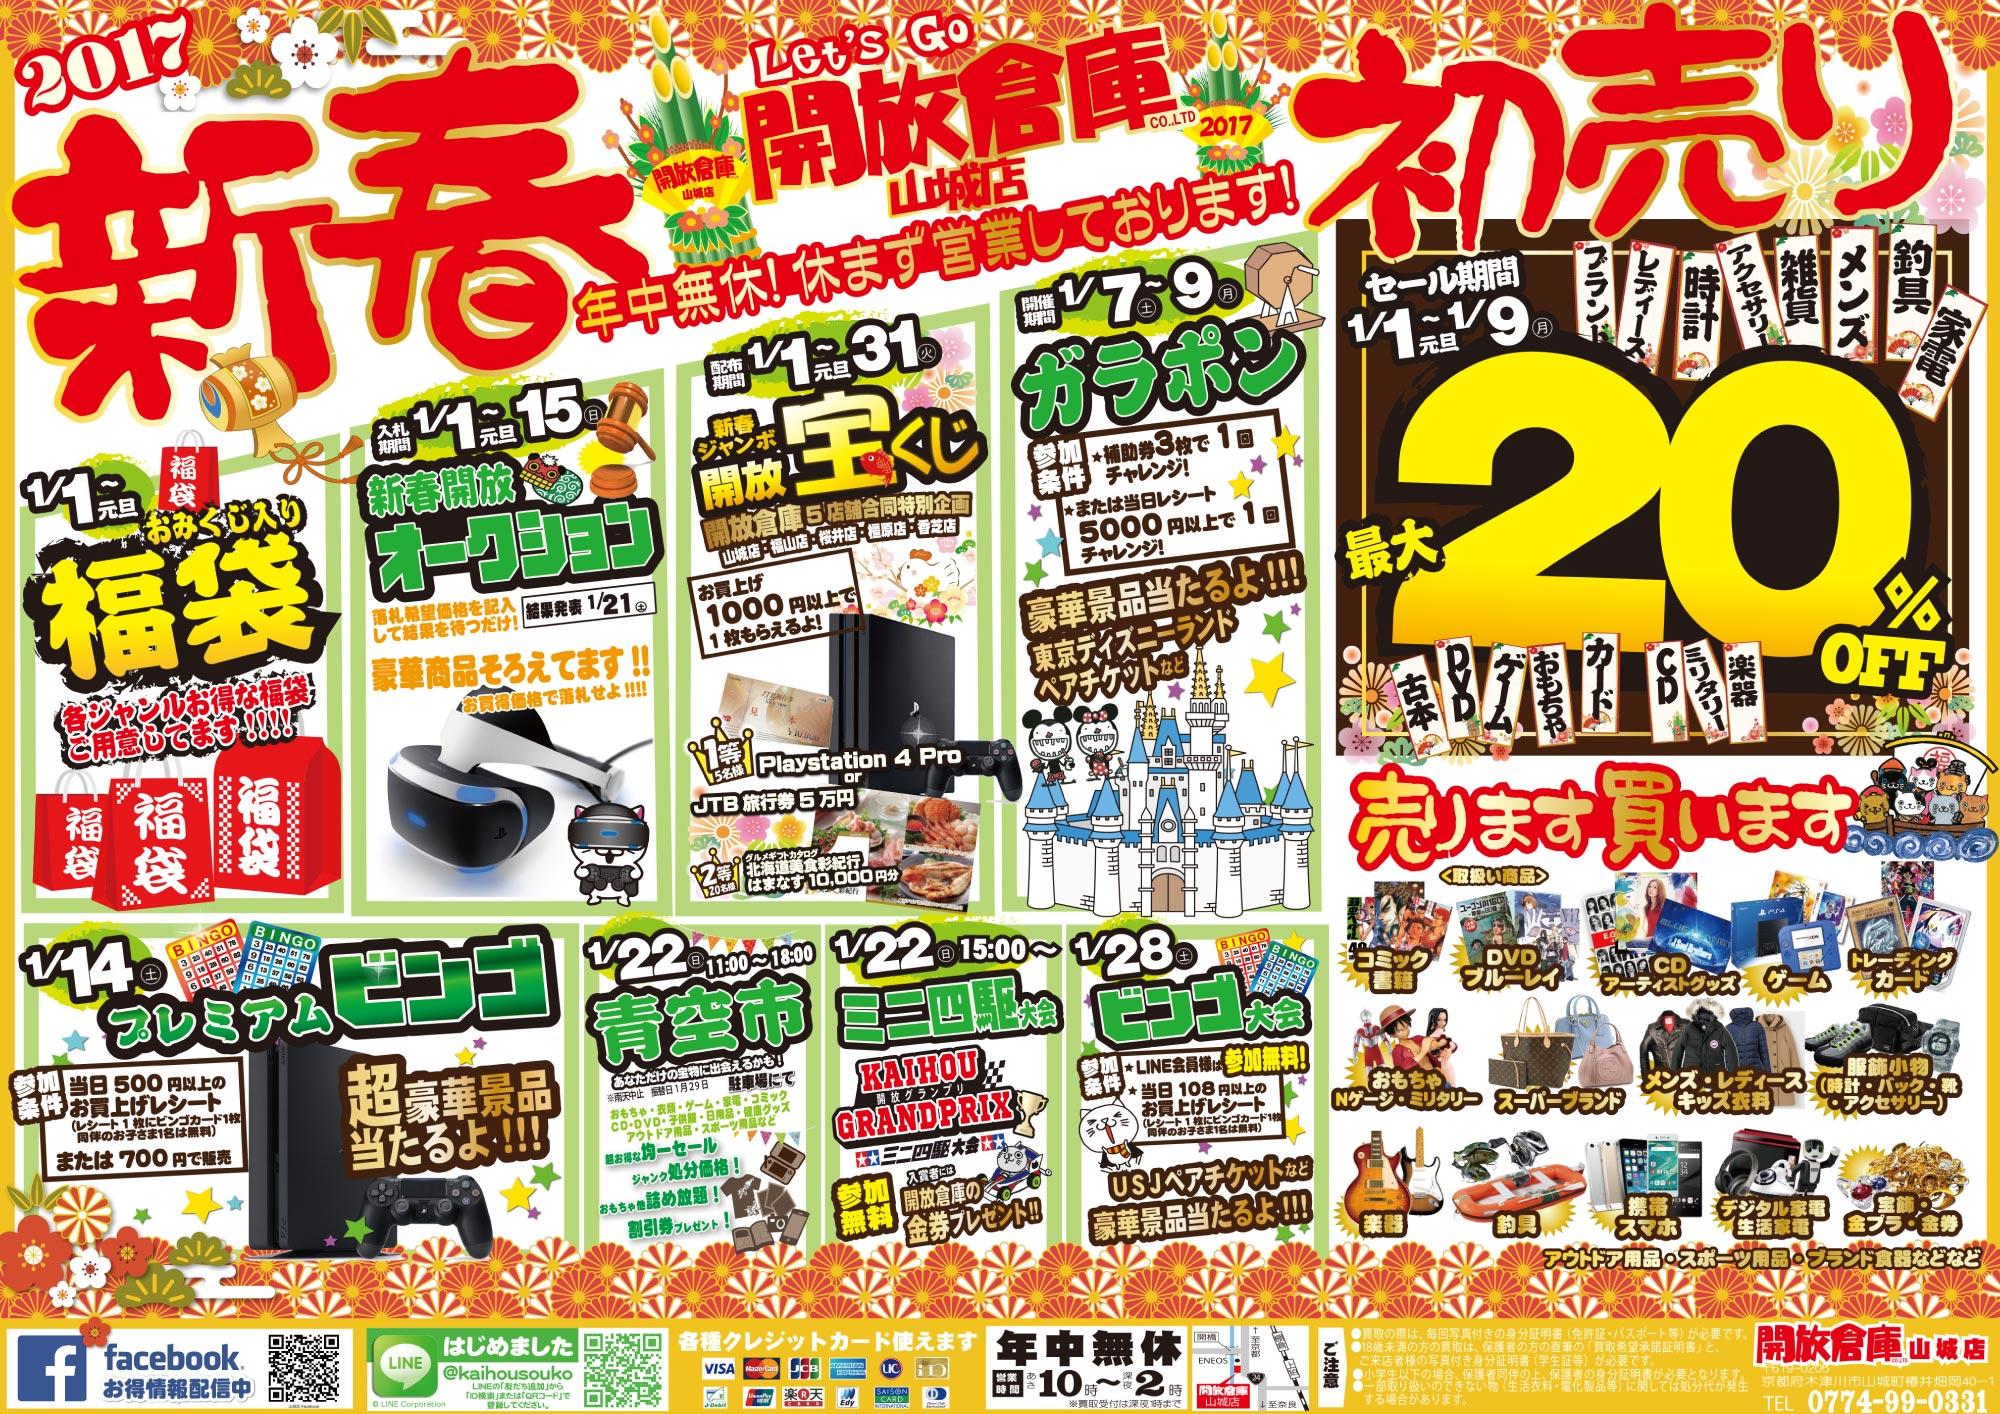 「開放倉庫山城店」2017年新春初売りチラシ!表面